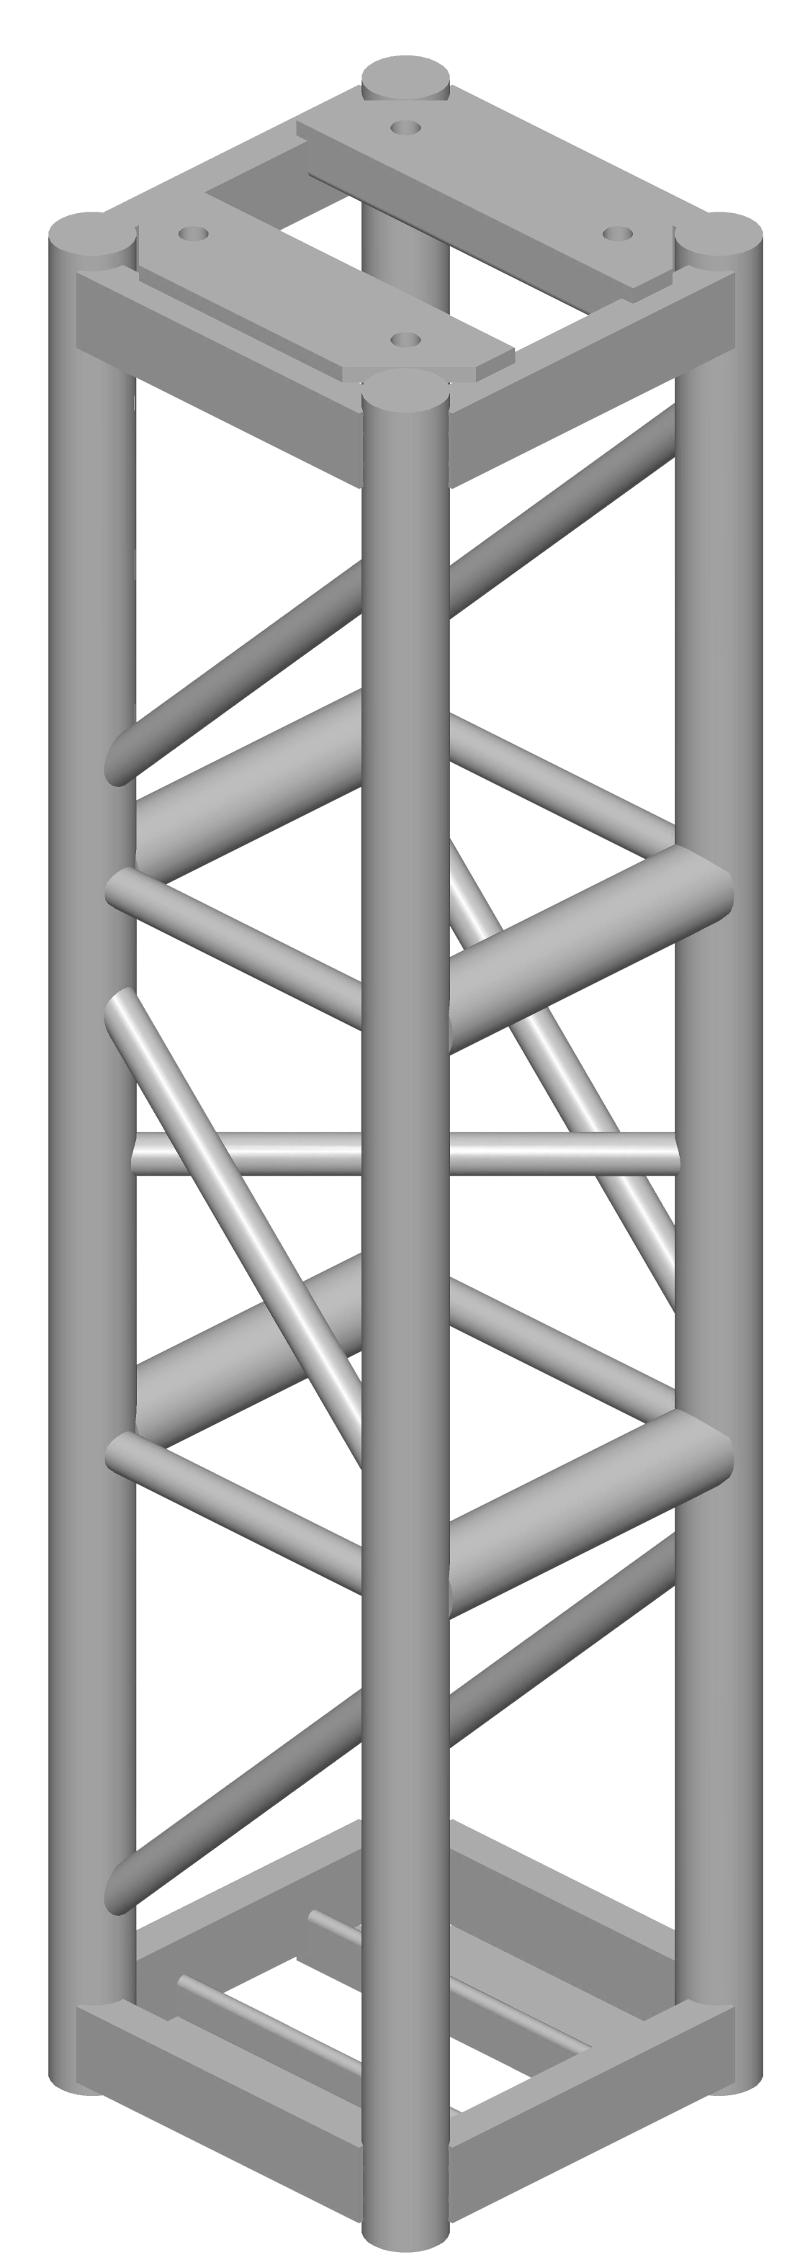 12x12 Square Truss,  4 ft Long